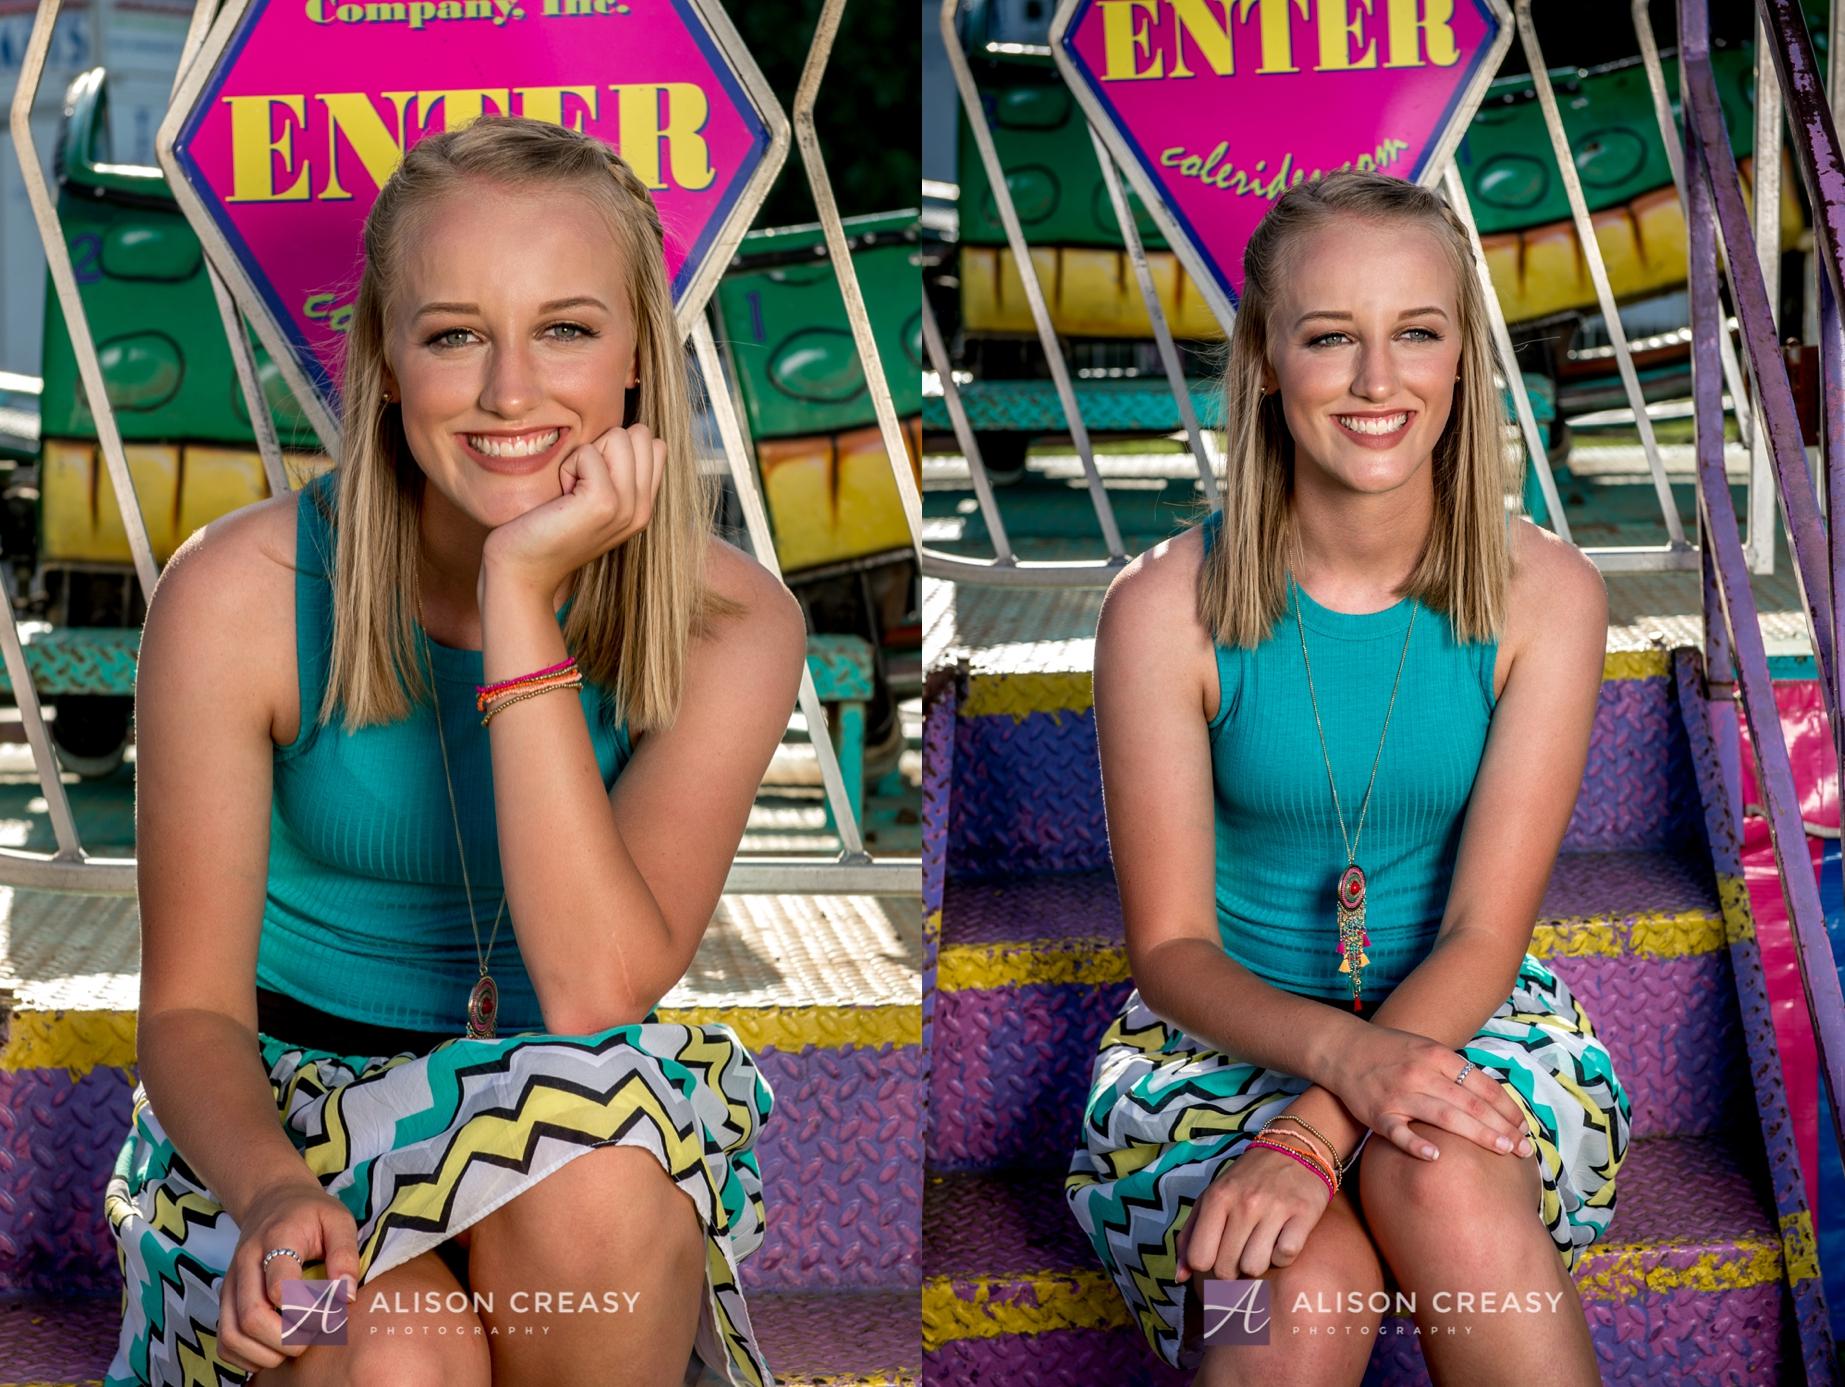 Alison-Creasy-Photography-Lynchburg-VA-Senior- Photographer_0009.jpg